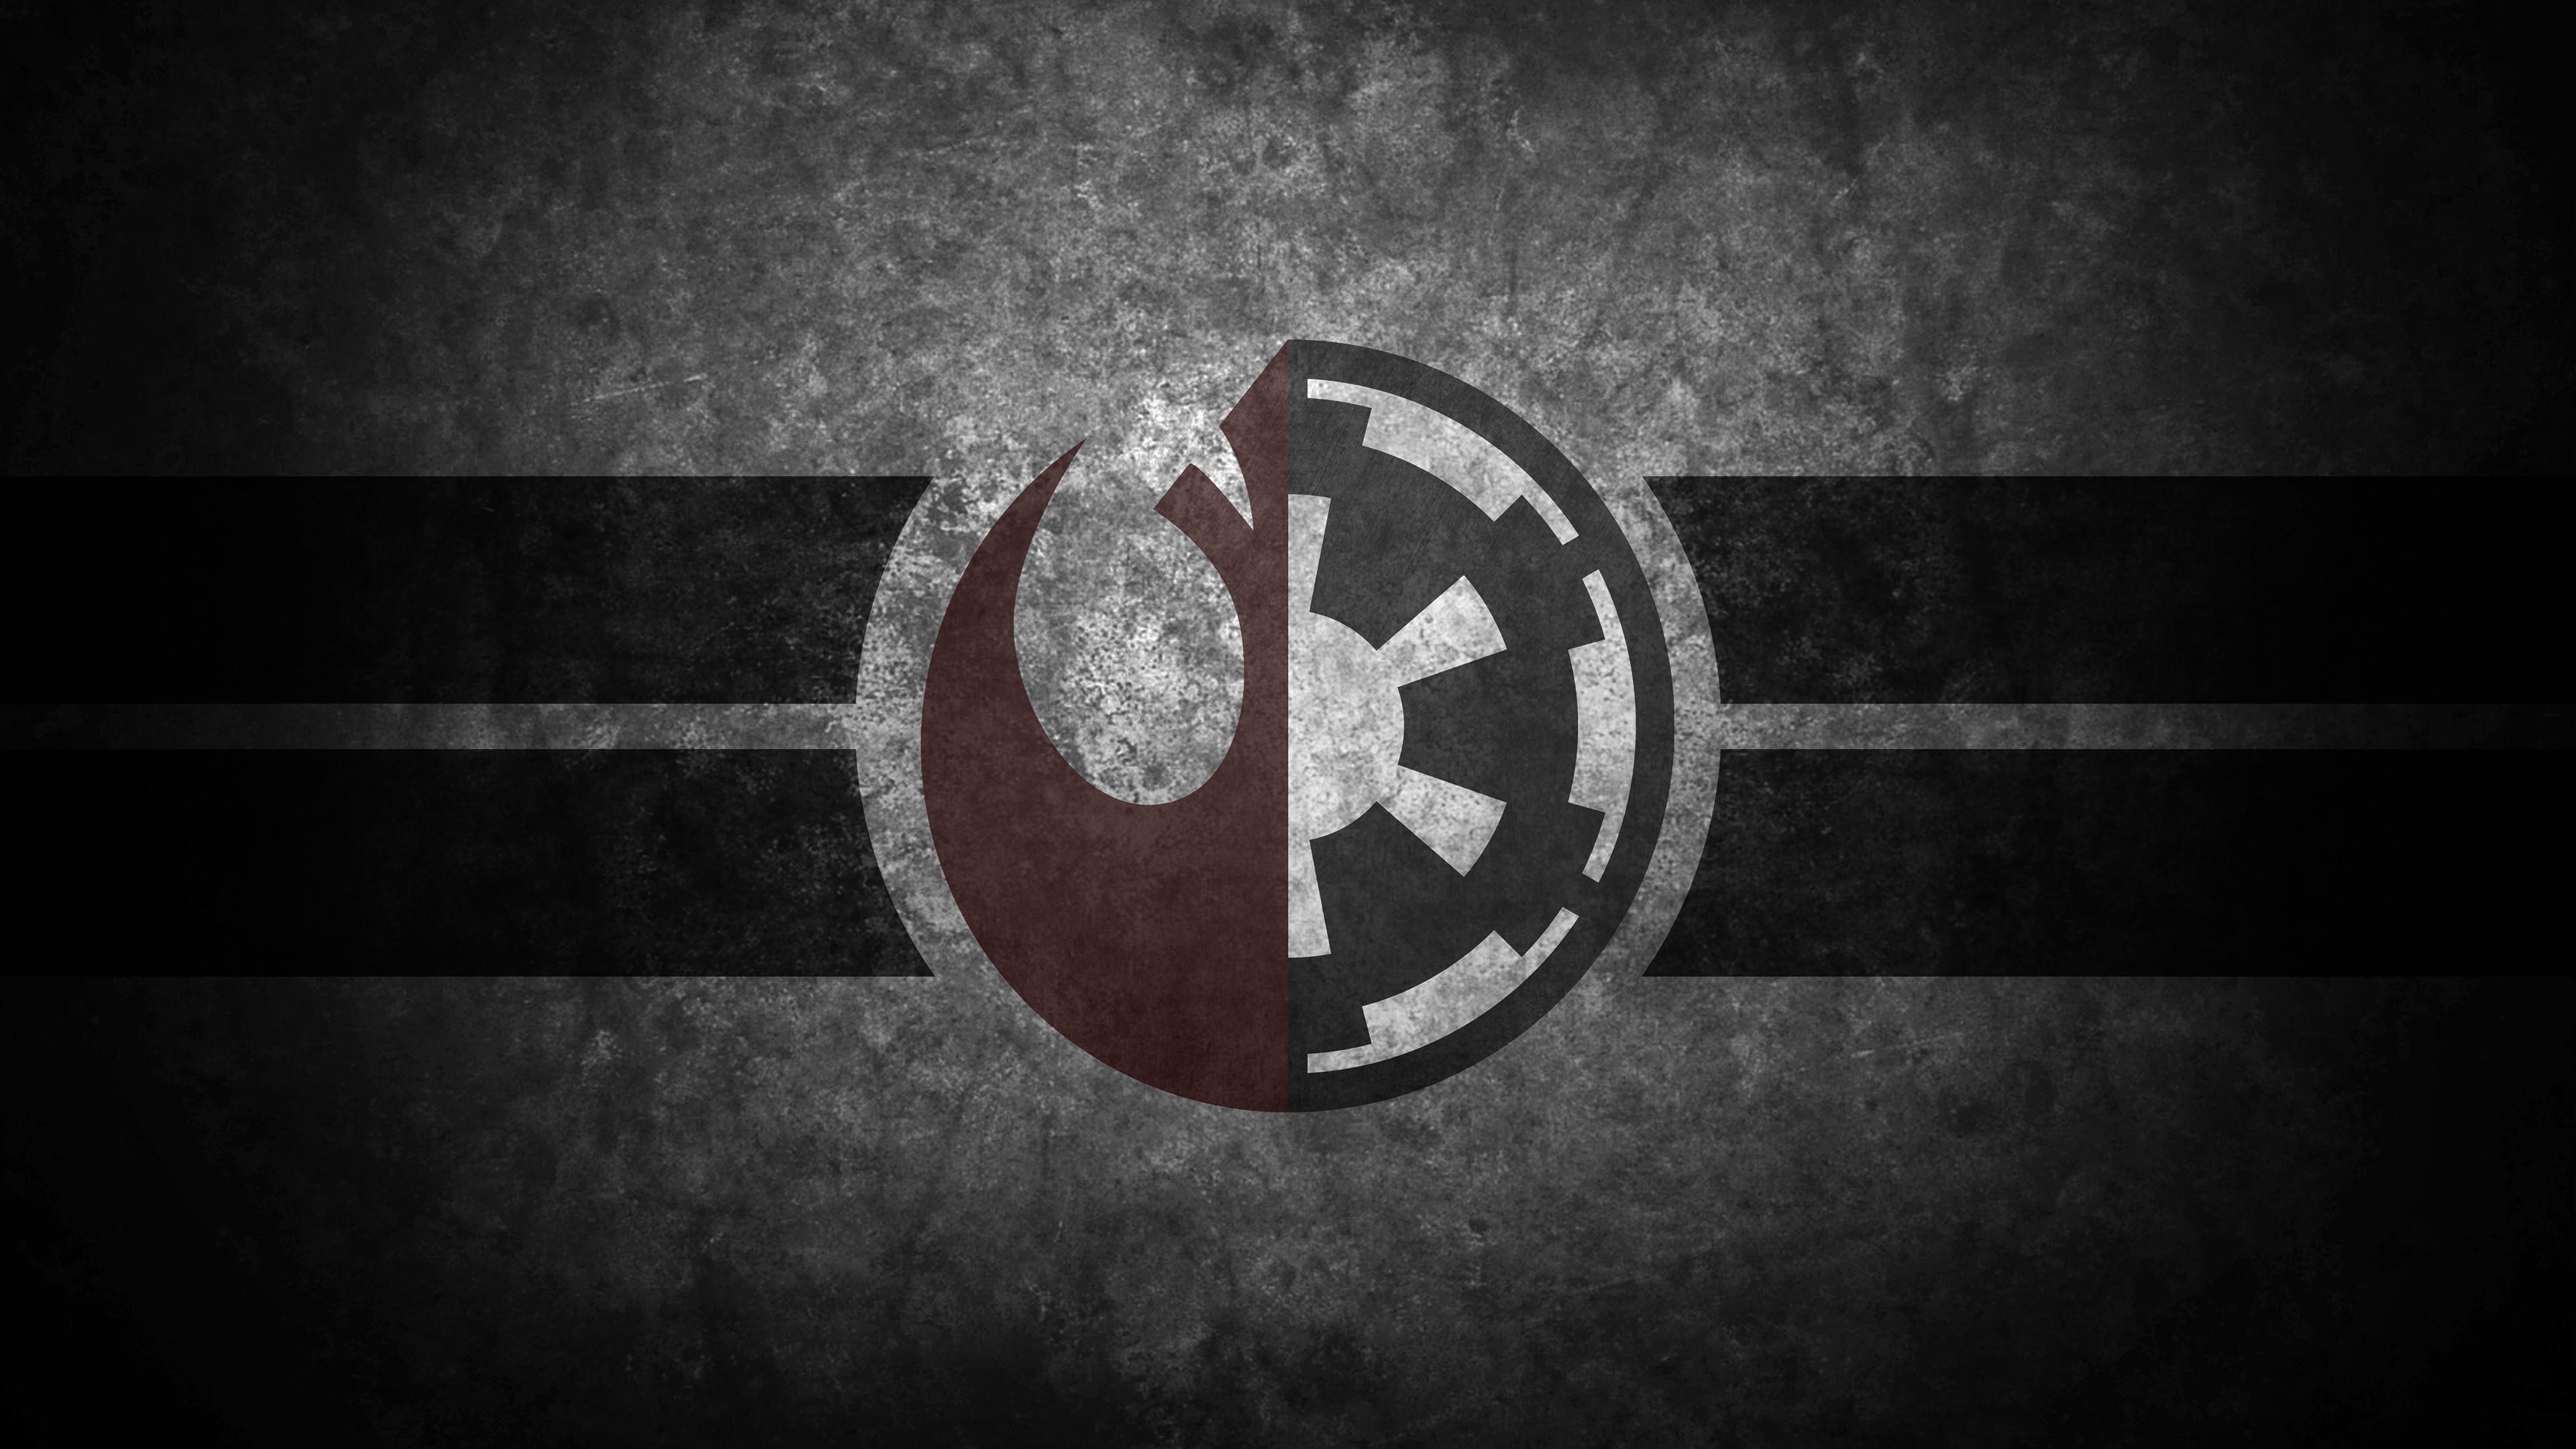 Star Wars Imperial Wallpaper